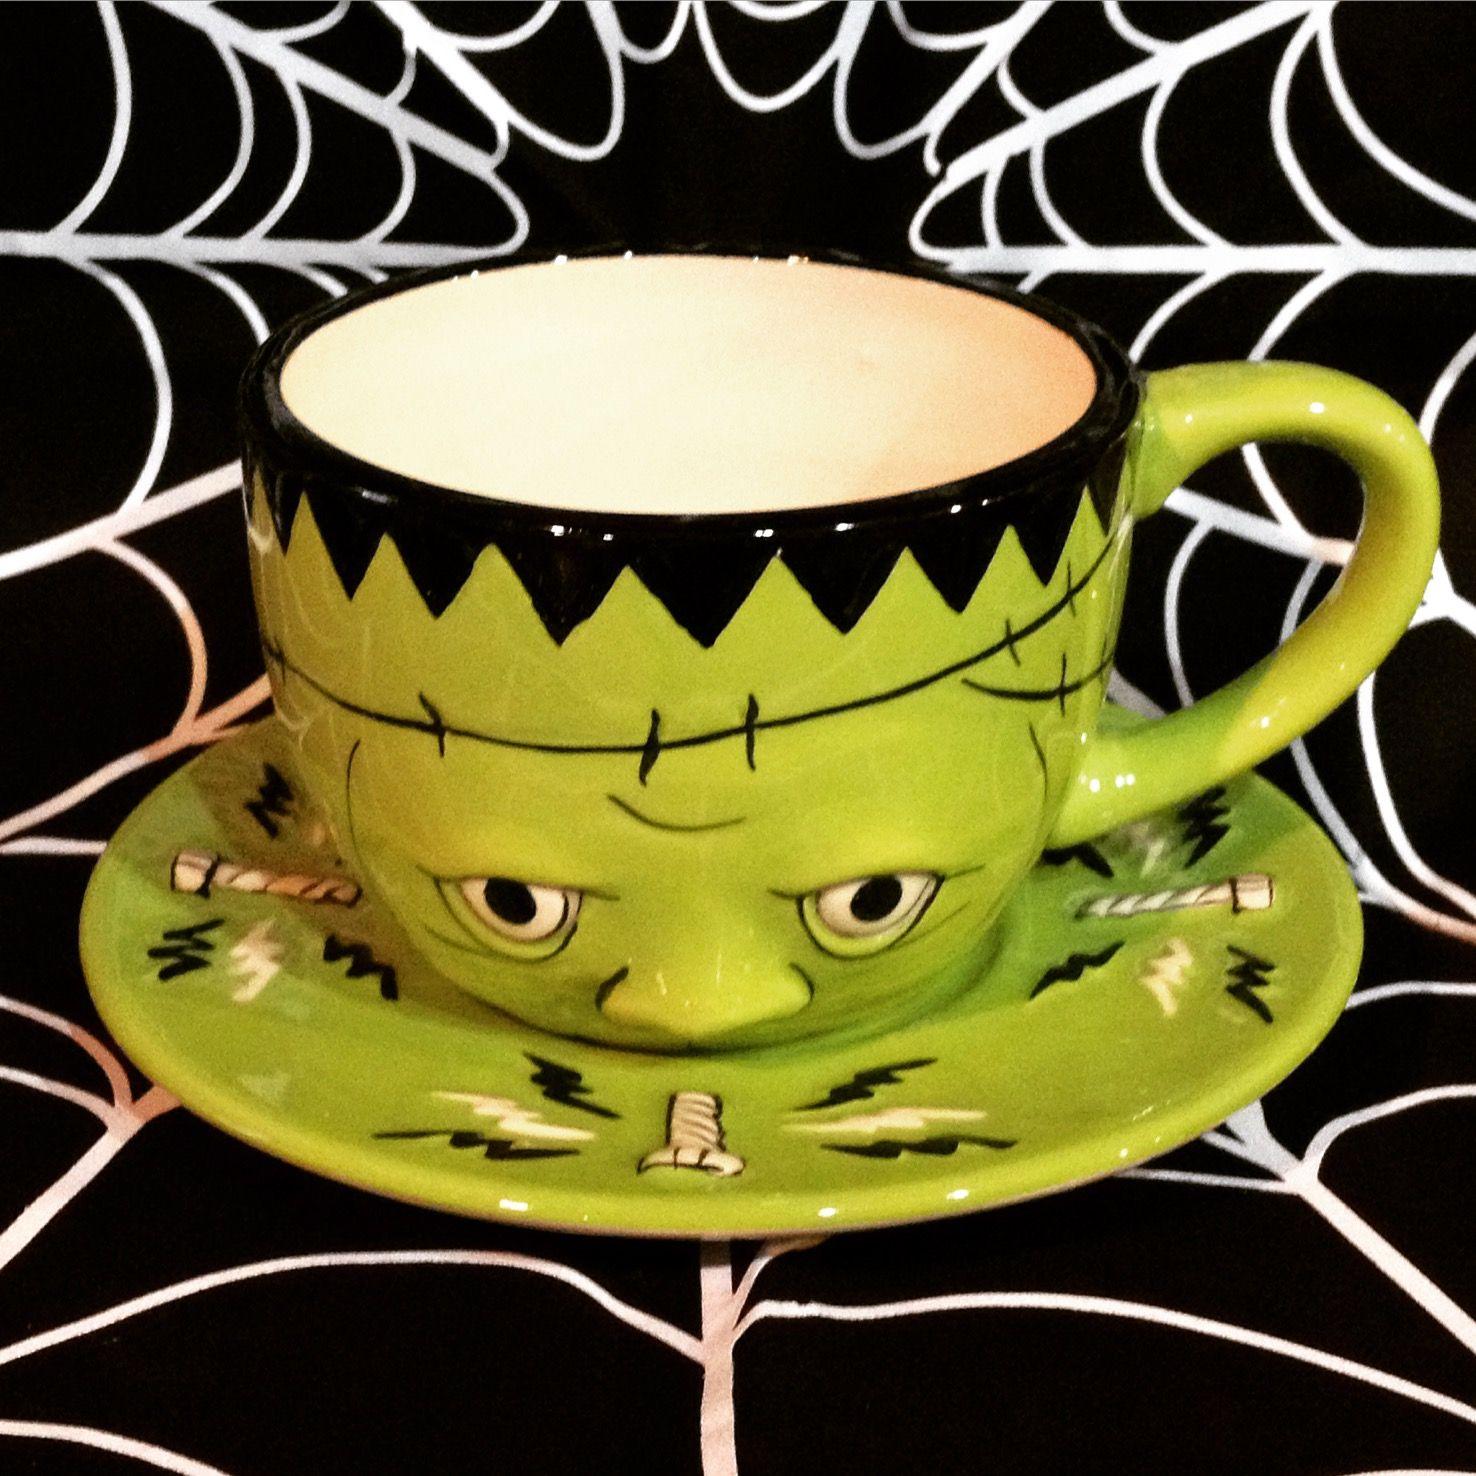 The sweetest Frankenstein cup and saucer set! #blamebetty #frankenstein #monster